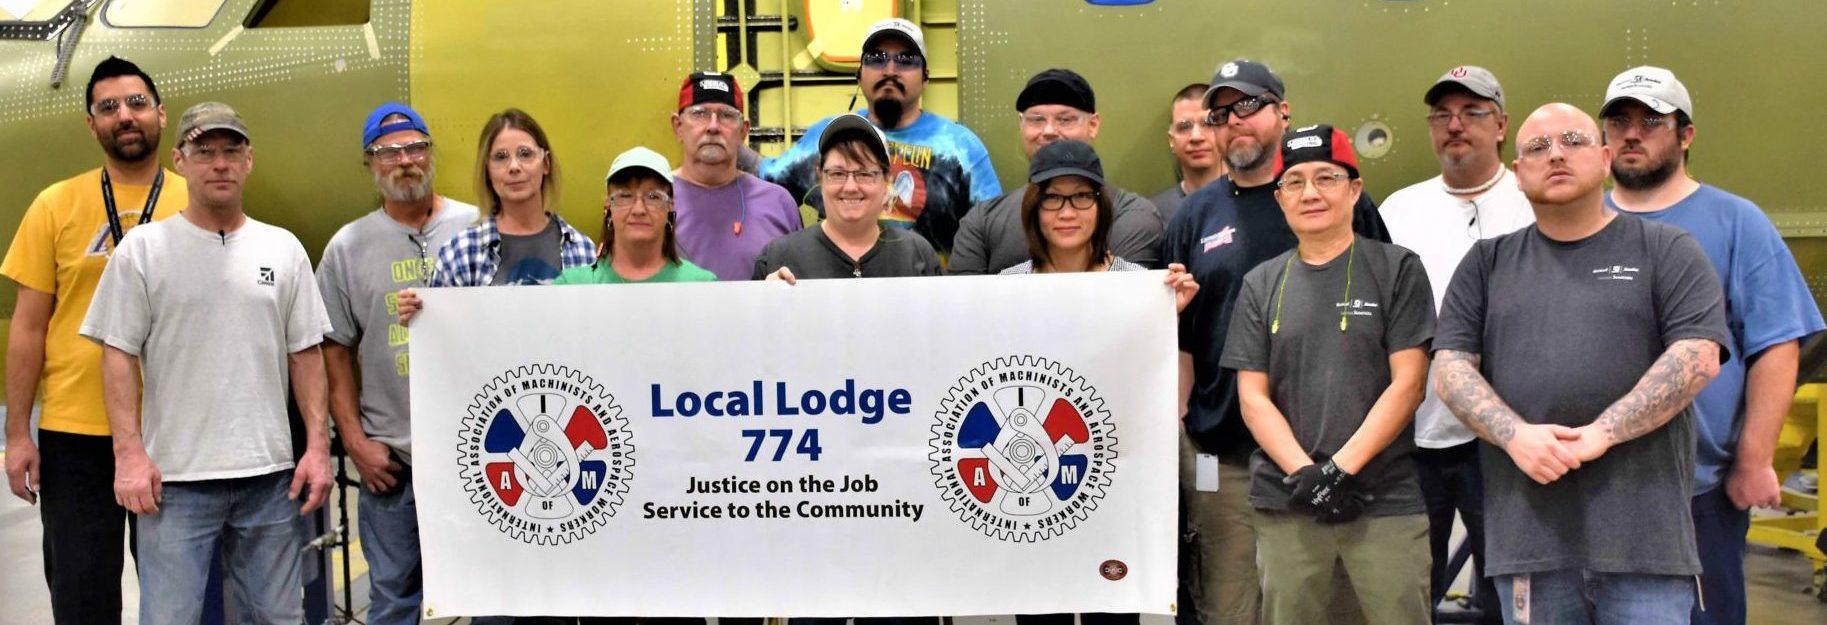 IAM Local Lodge 774